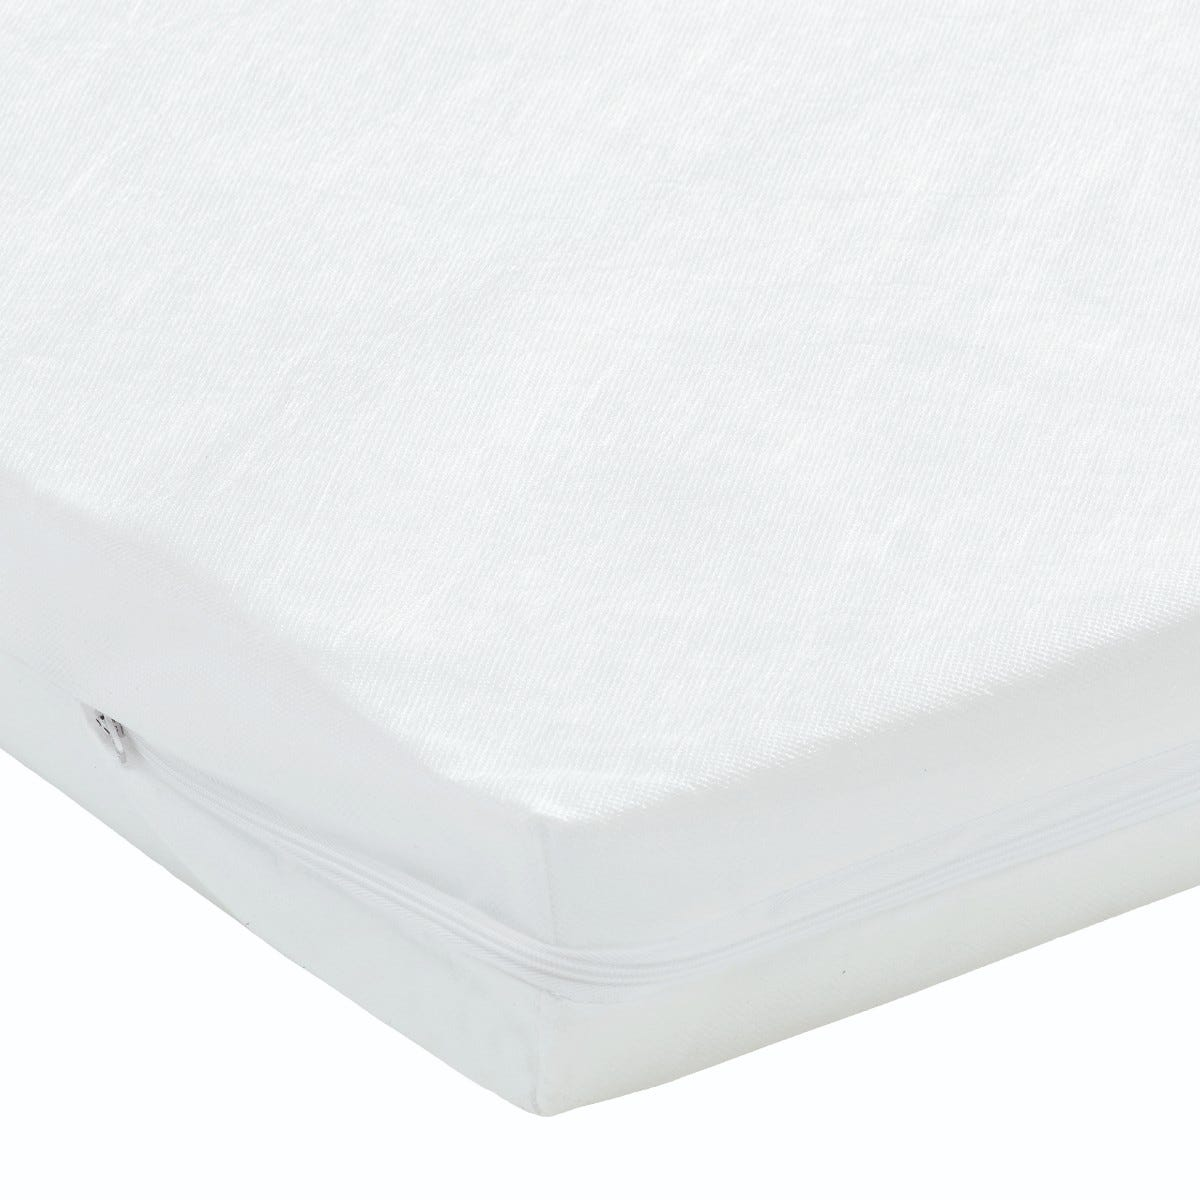 Babymore Deluxe Foam Cot Mattress 100 x 50 x 10 CM